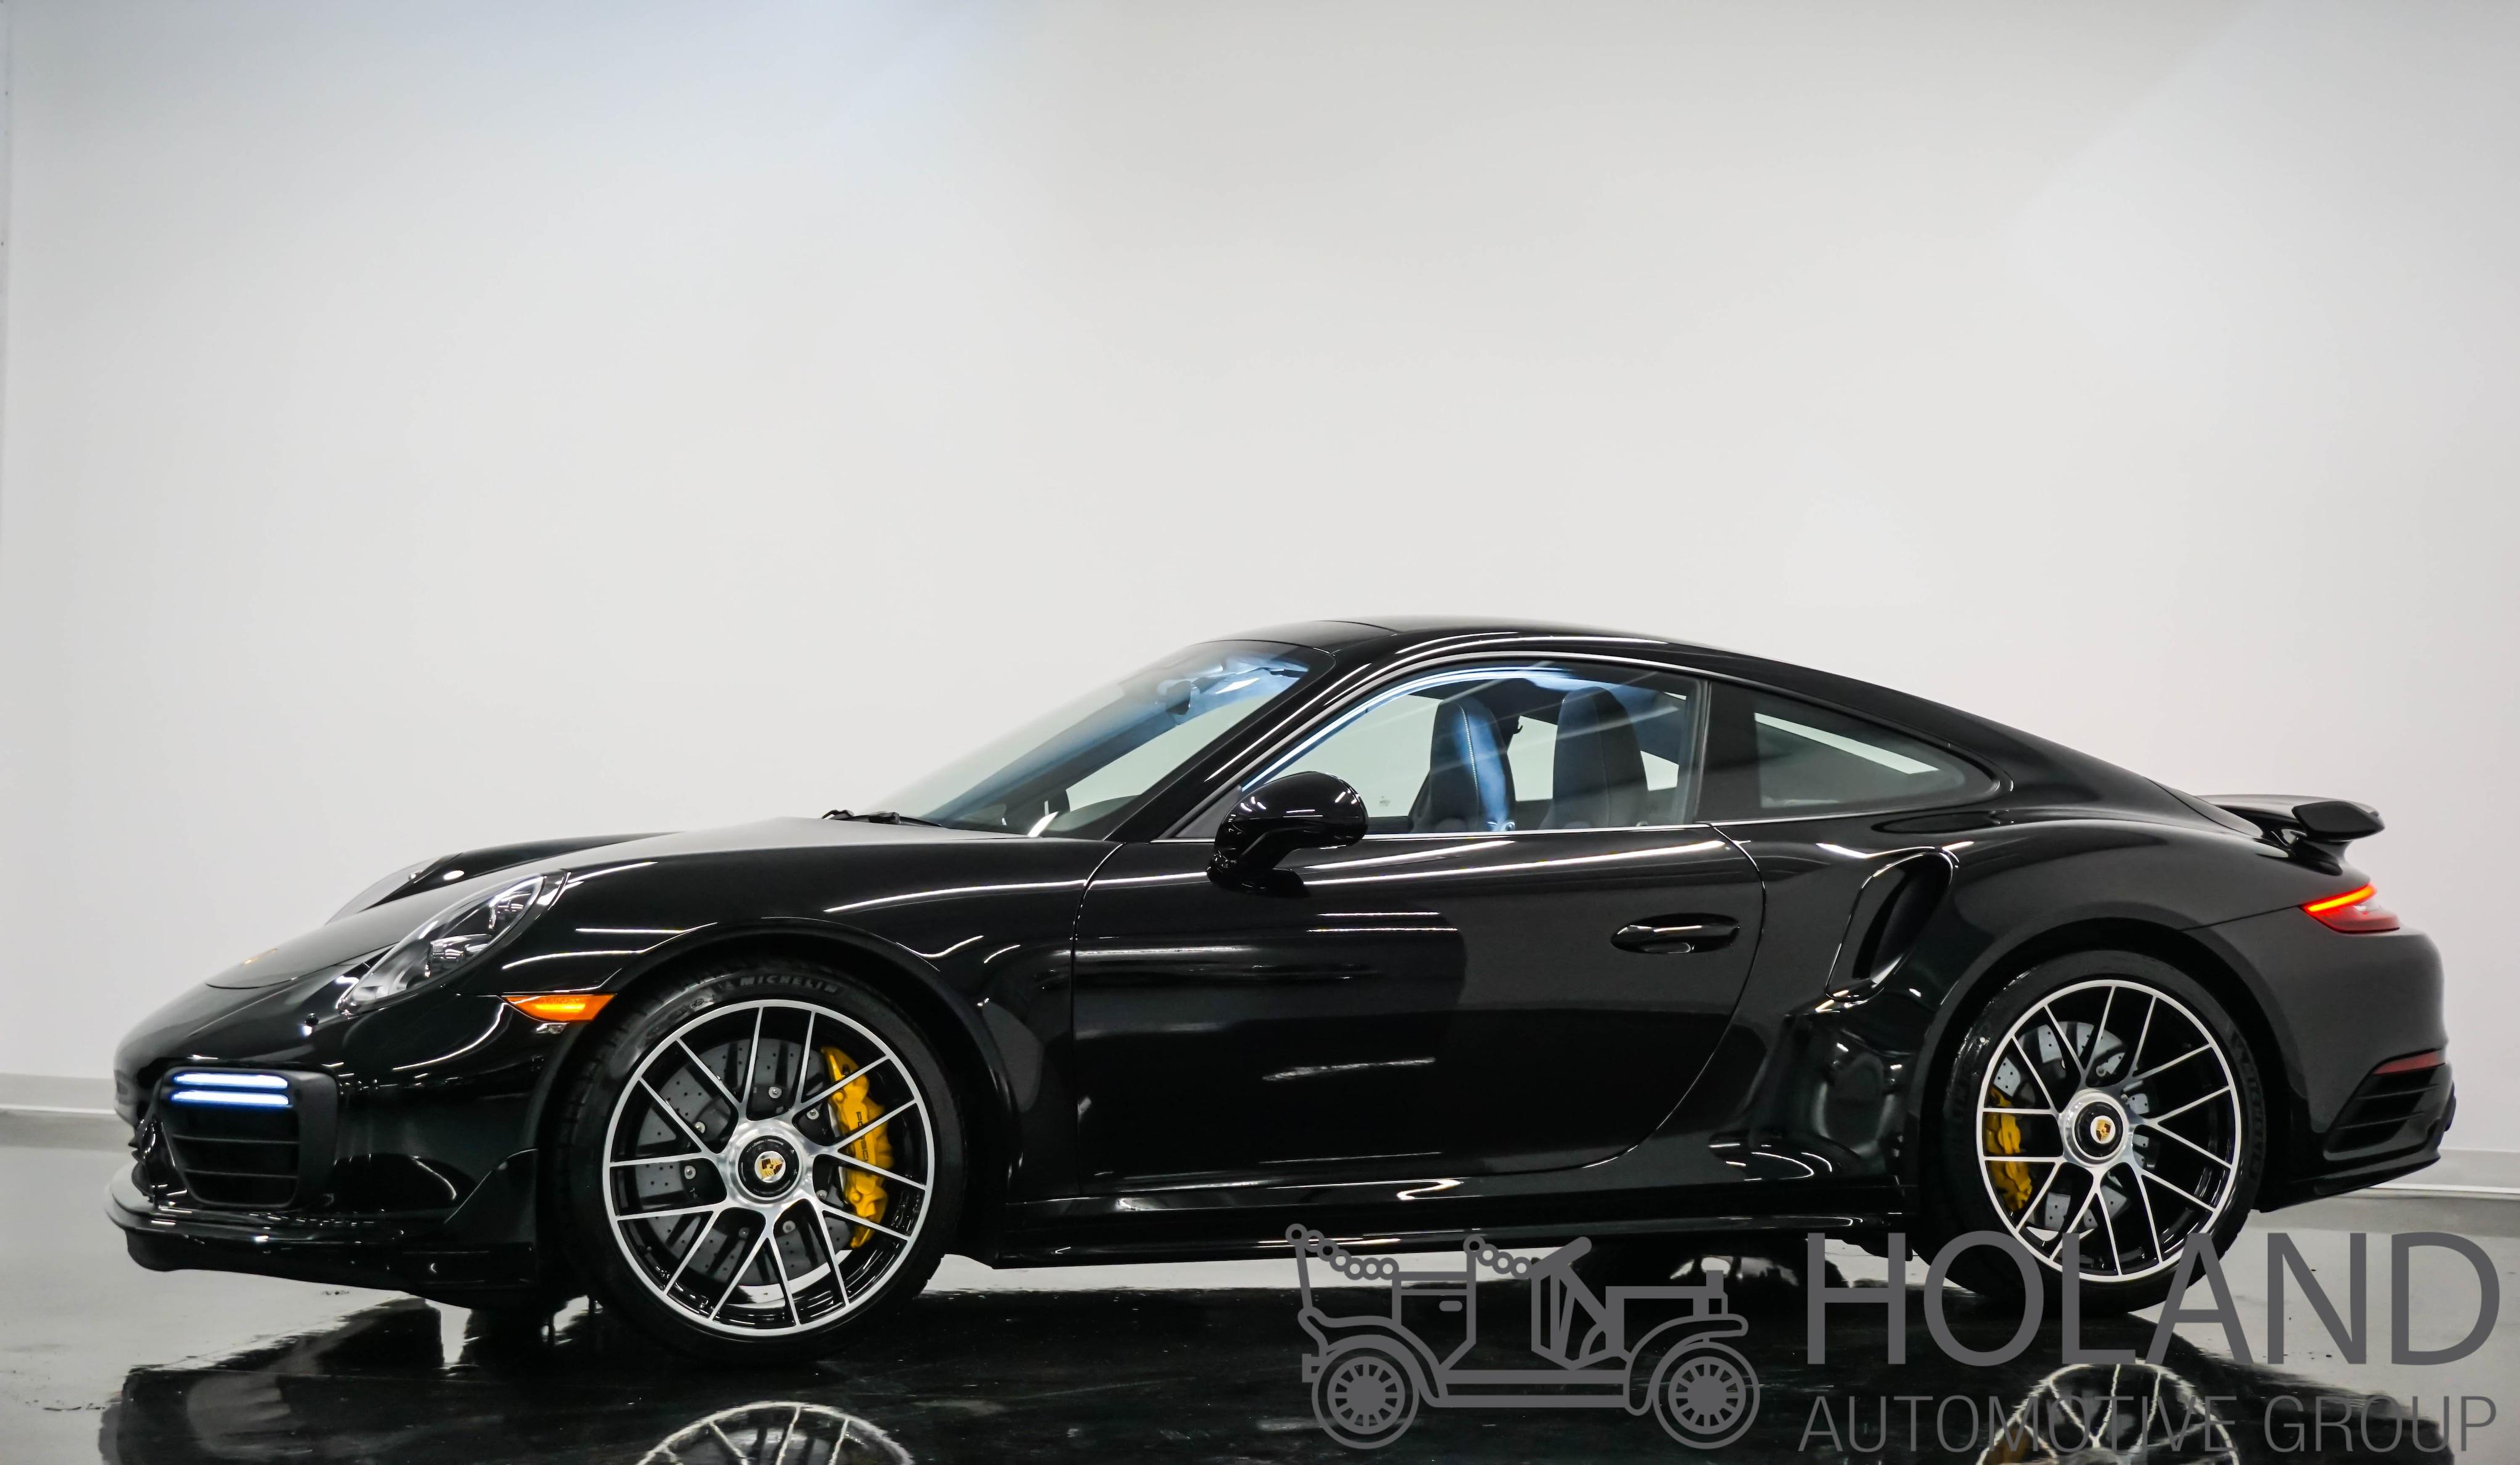 2018 Porsche 911 Turbo S Coupé